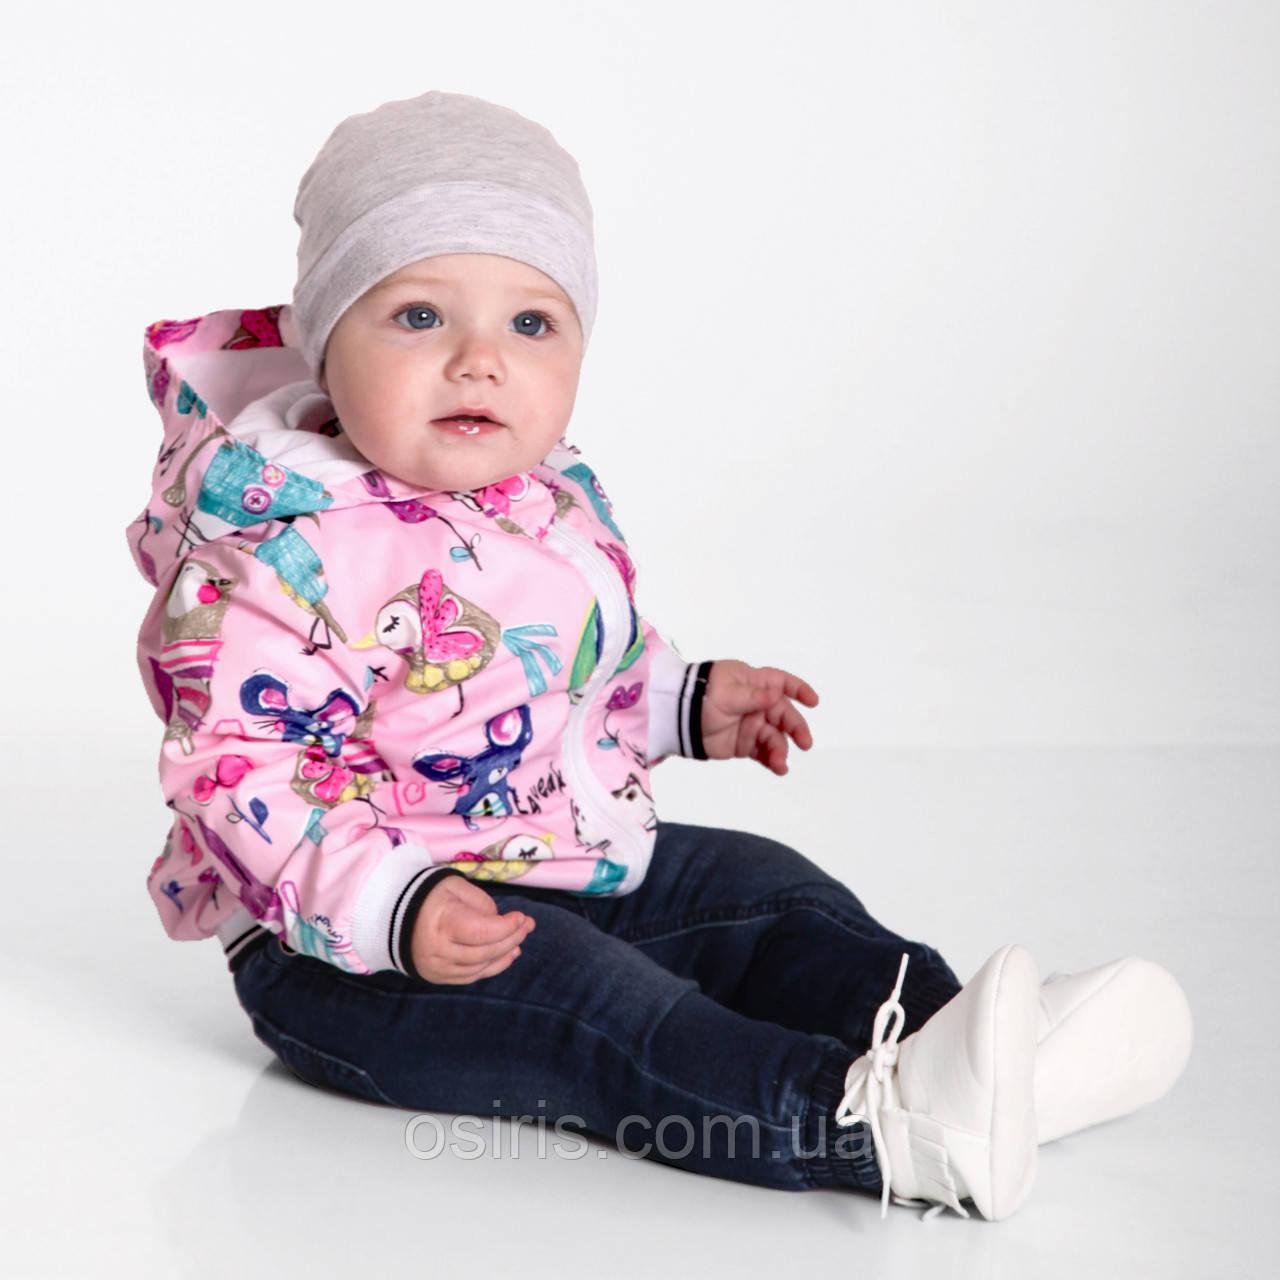 Ветровка детская Доречи Рисунки на розовом фоне (Размер 92, 98, 104, 110)